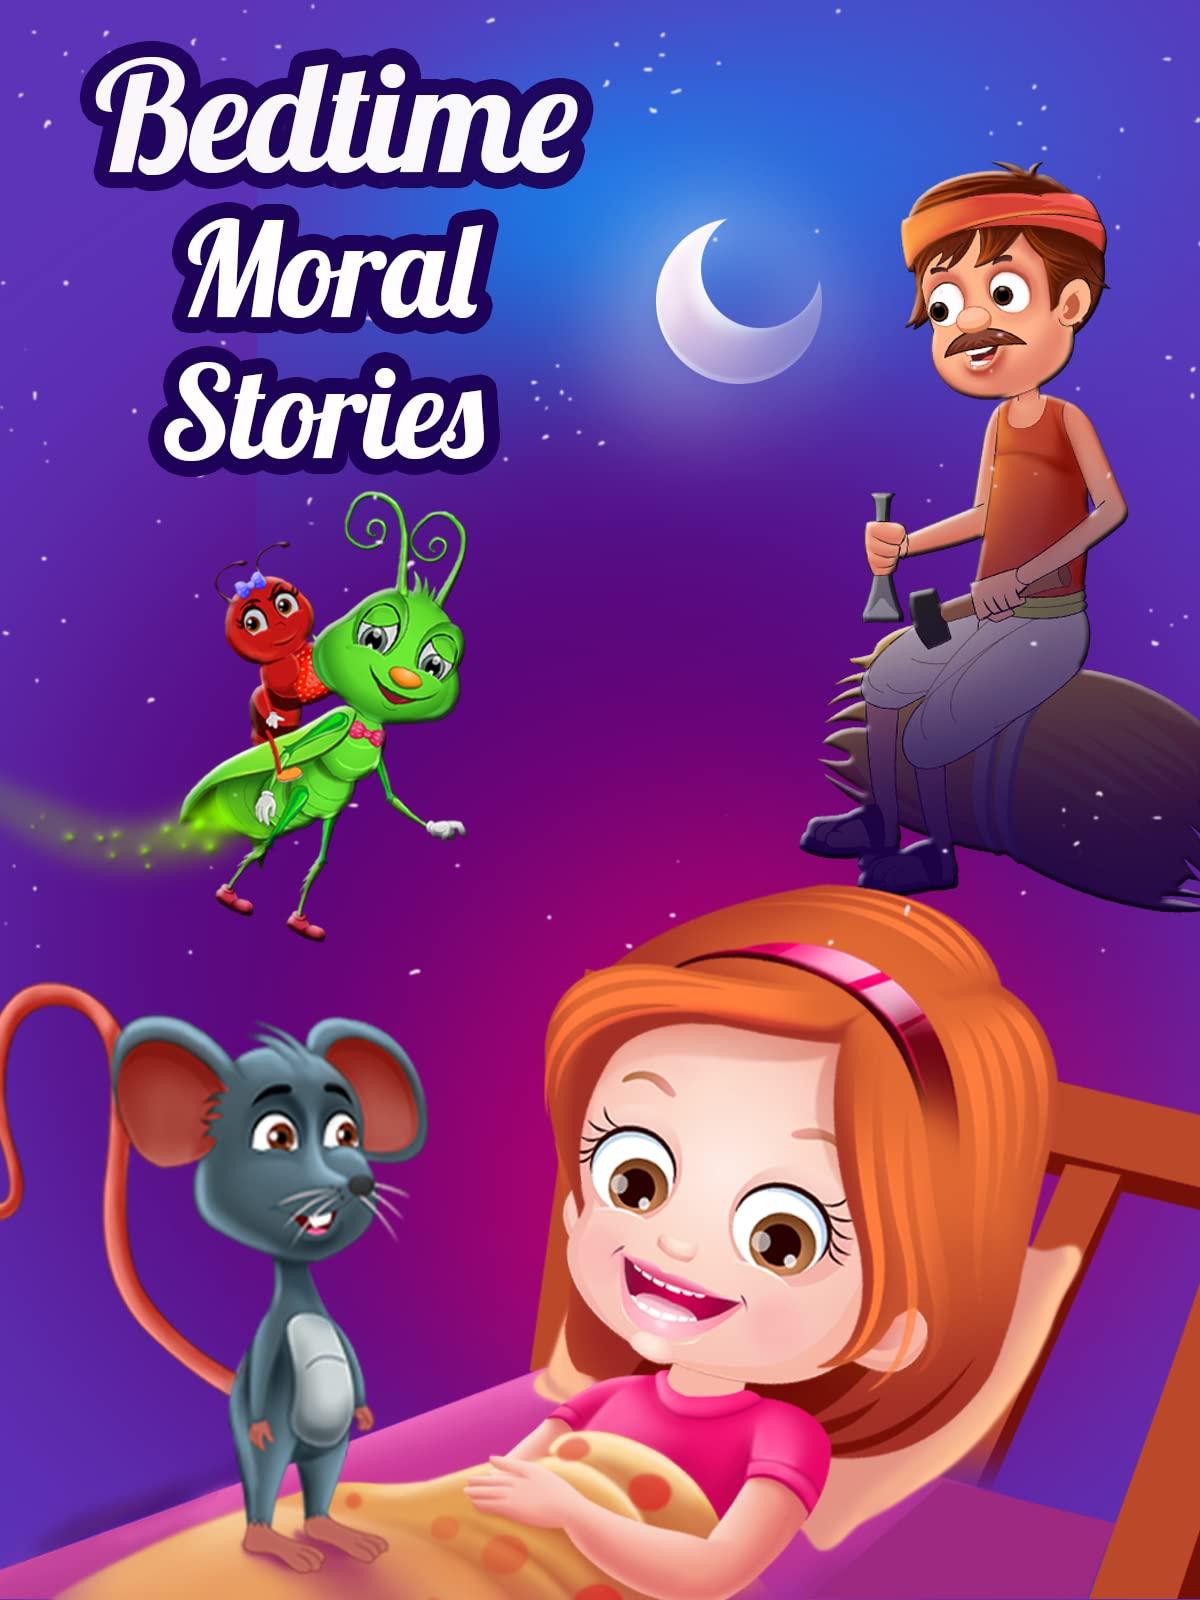 Bedtime Moral stories